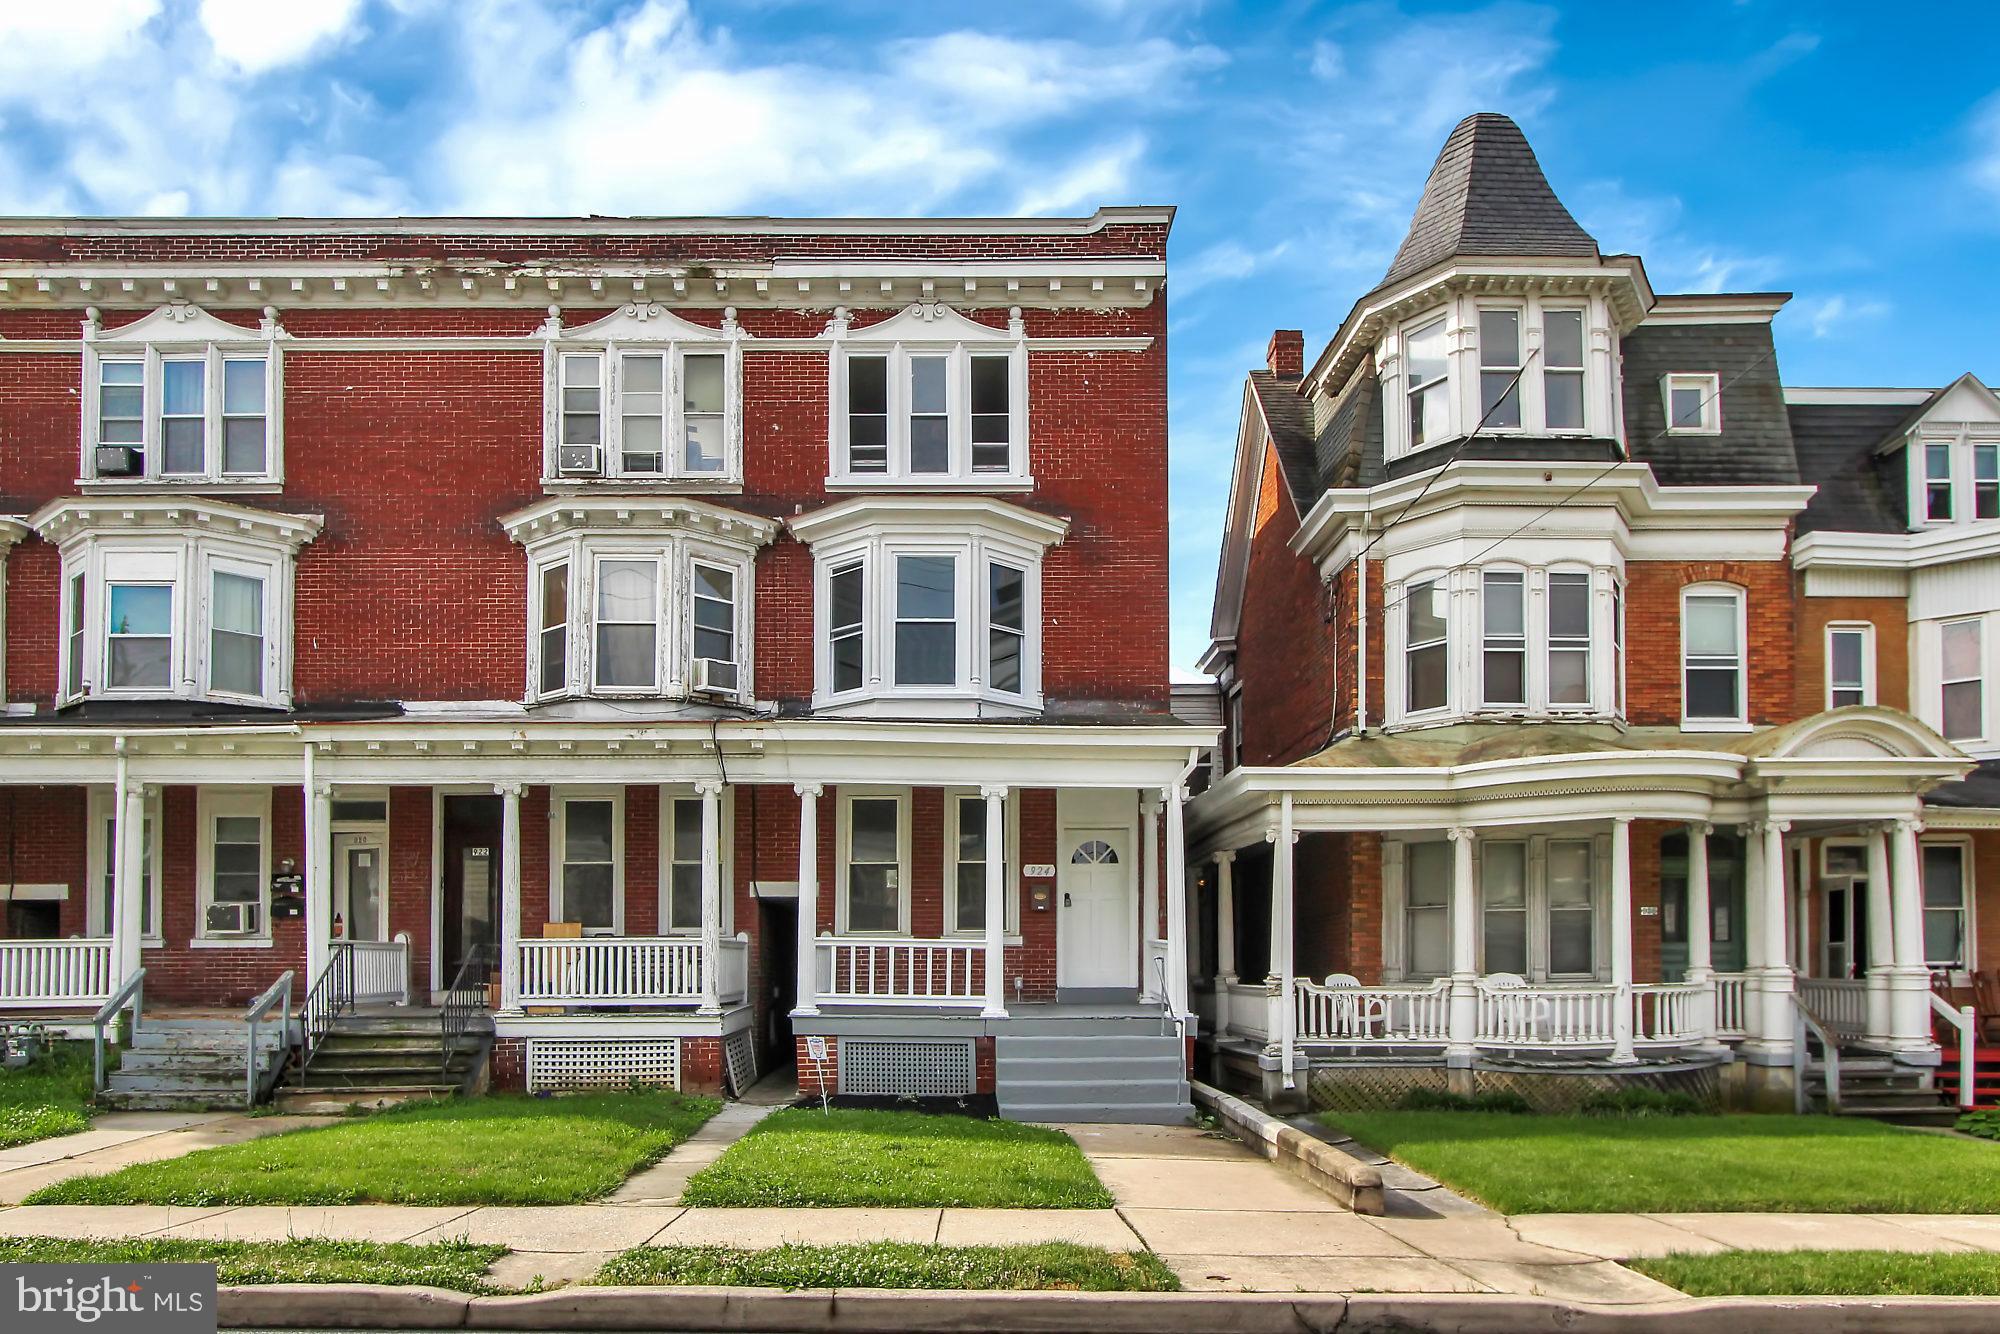 924 W King Street, York, PA 17401